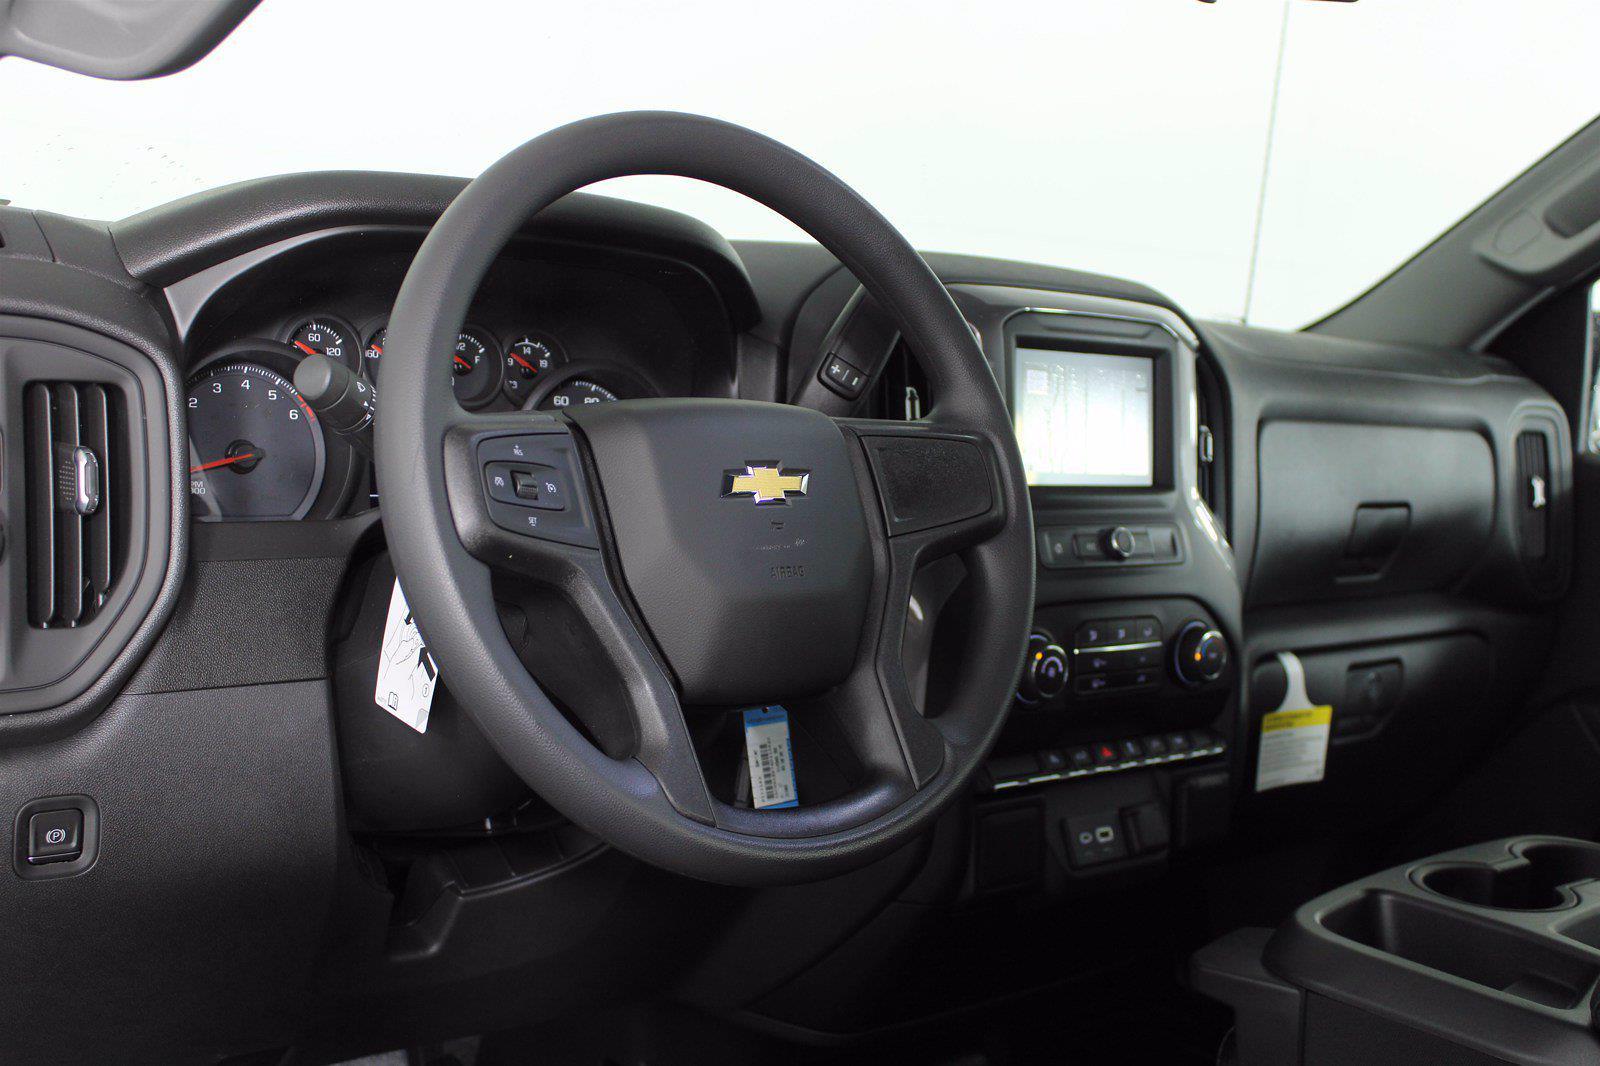 2021 Silverado 1500 Regular Cab 4x2,  Pickup #D111163 - photo 10